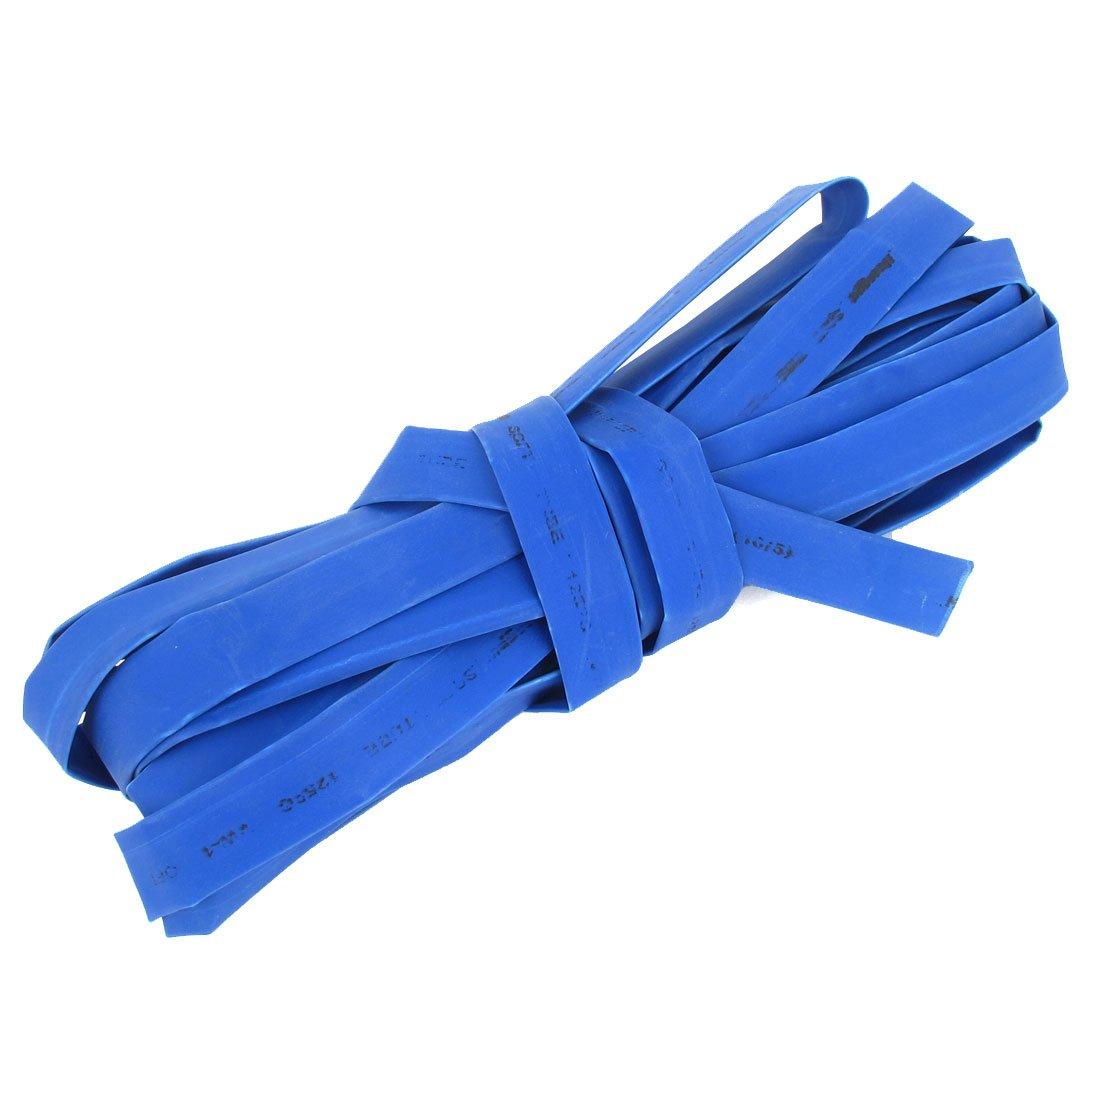 10mm Dia. Heat Shrinkable Tube Shrink Tubing 7.5m Length Blue Sourcingmap a14072400ux0126